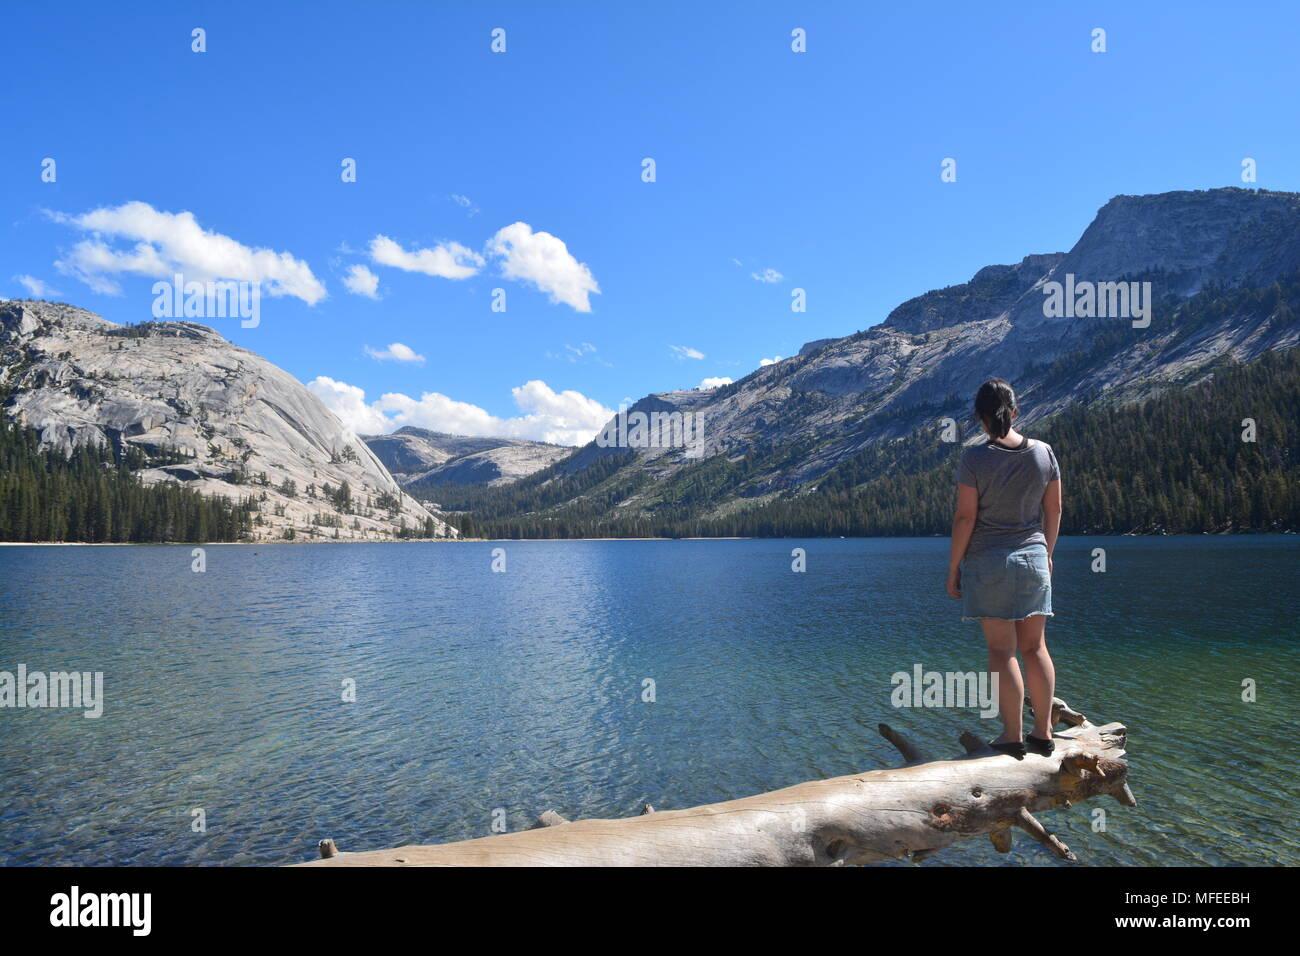 View of Yosemite national Park - Stock Image